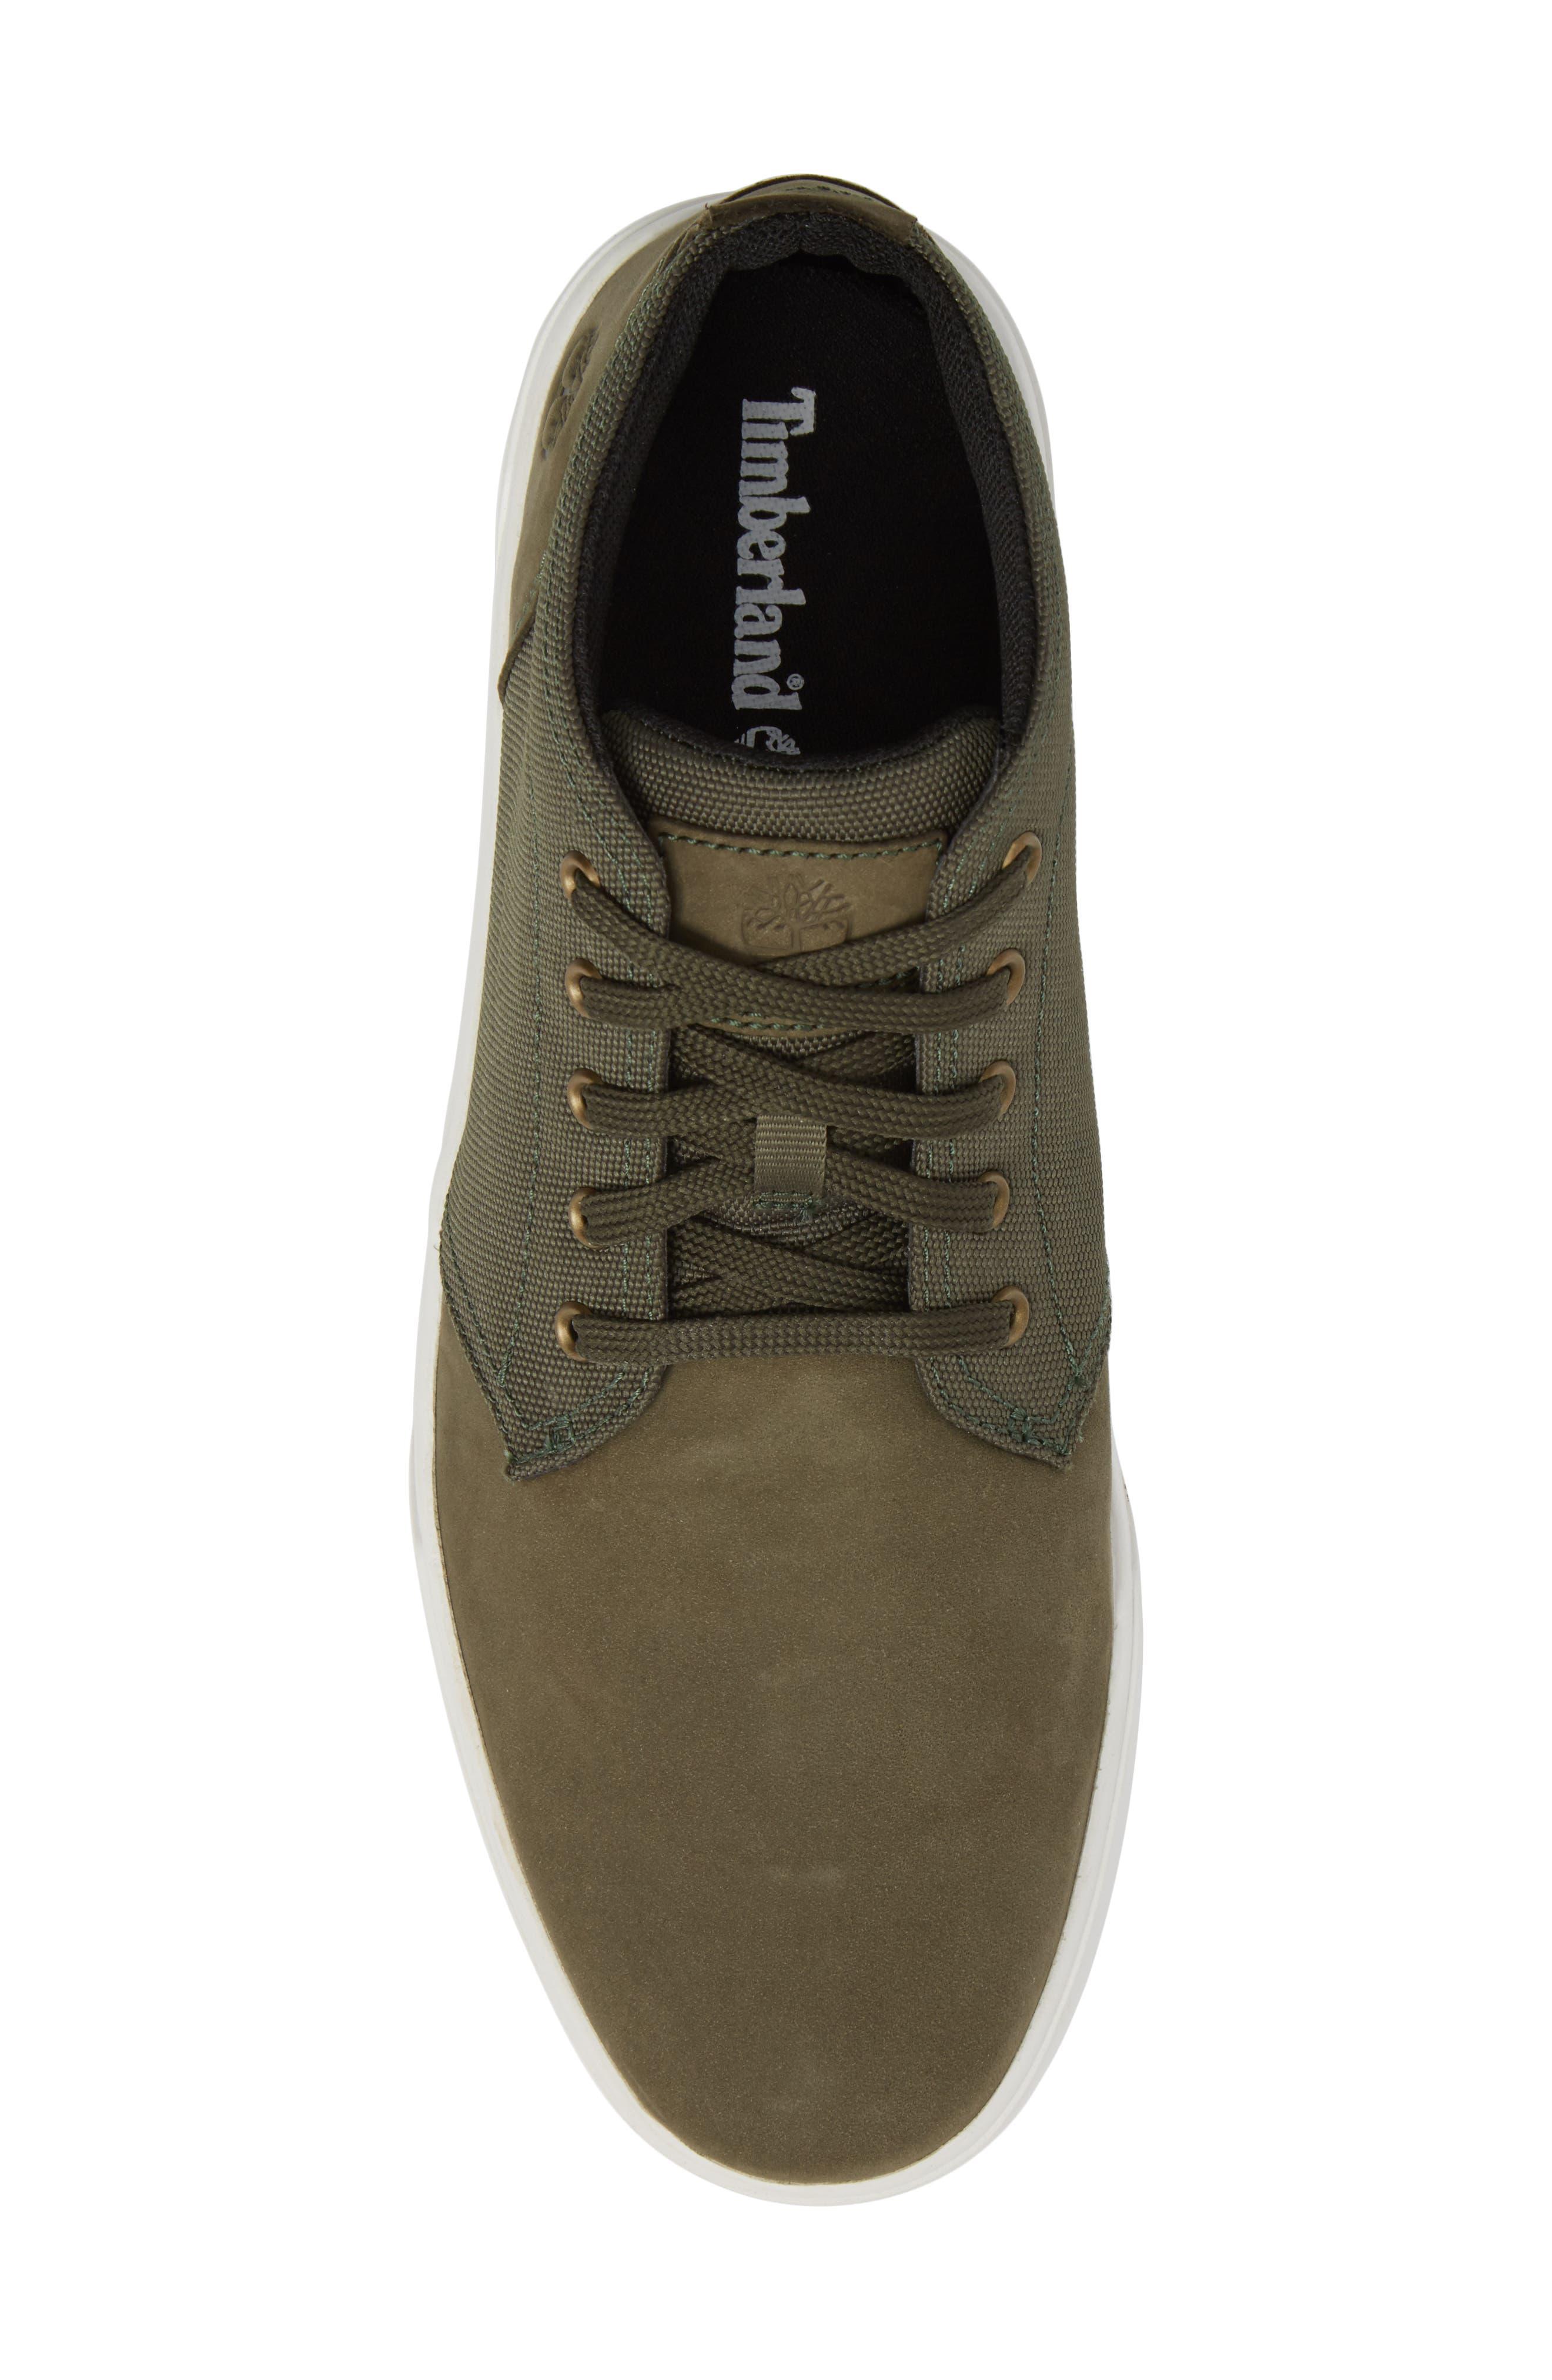 Earthkeepers<sup>®</sup> 'Groveton' Chukka Sneaker,                             Alternate thumbnail 5, color,                             Grape Leaf Leather